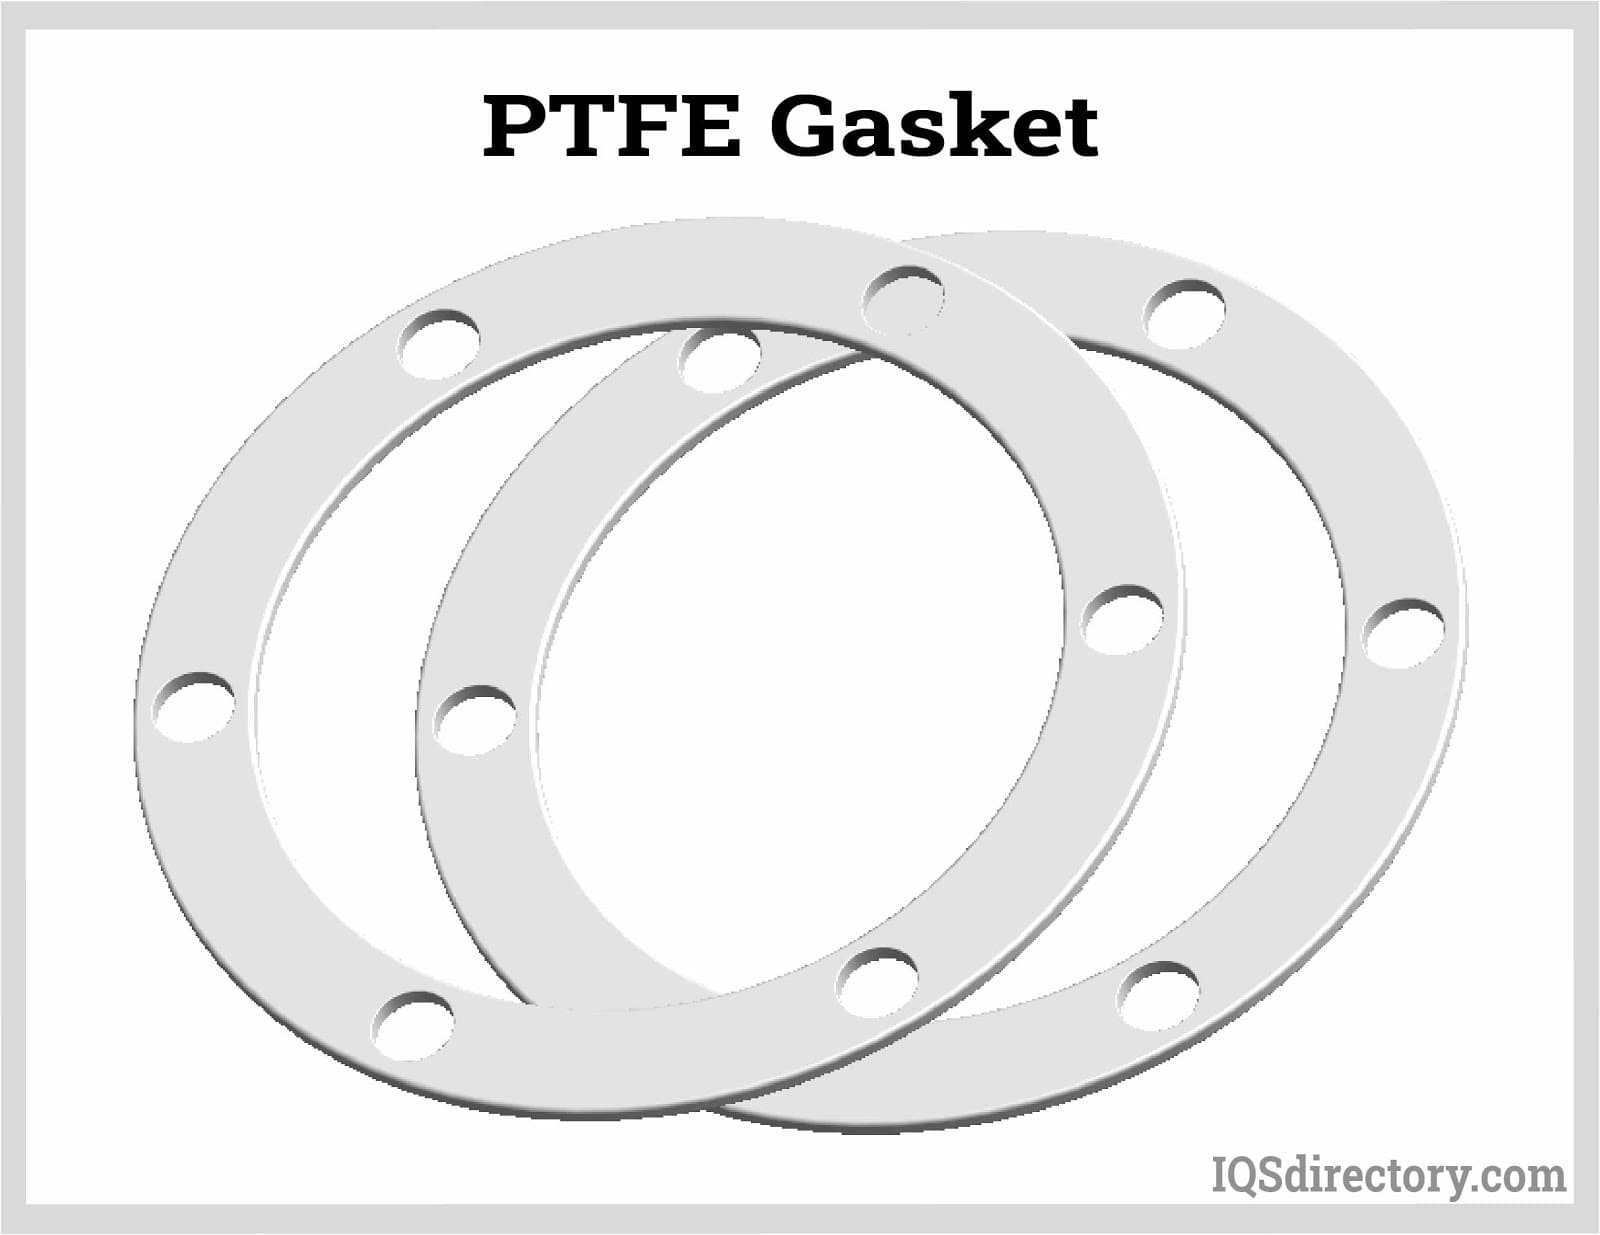 PTFE Gasket